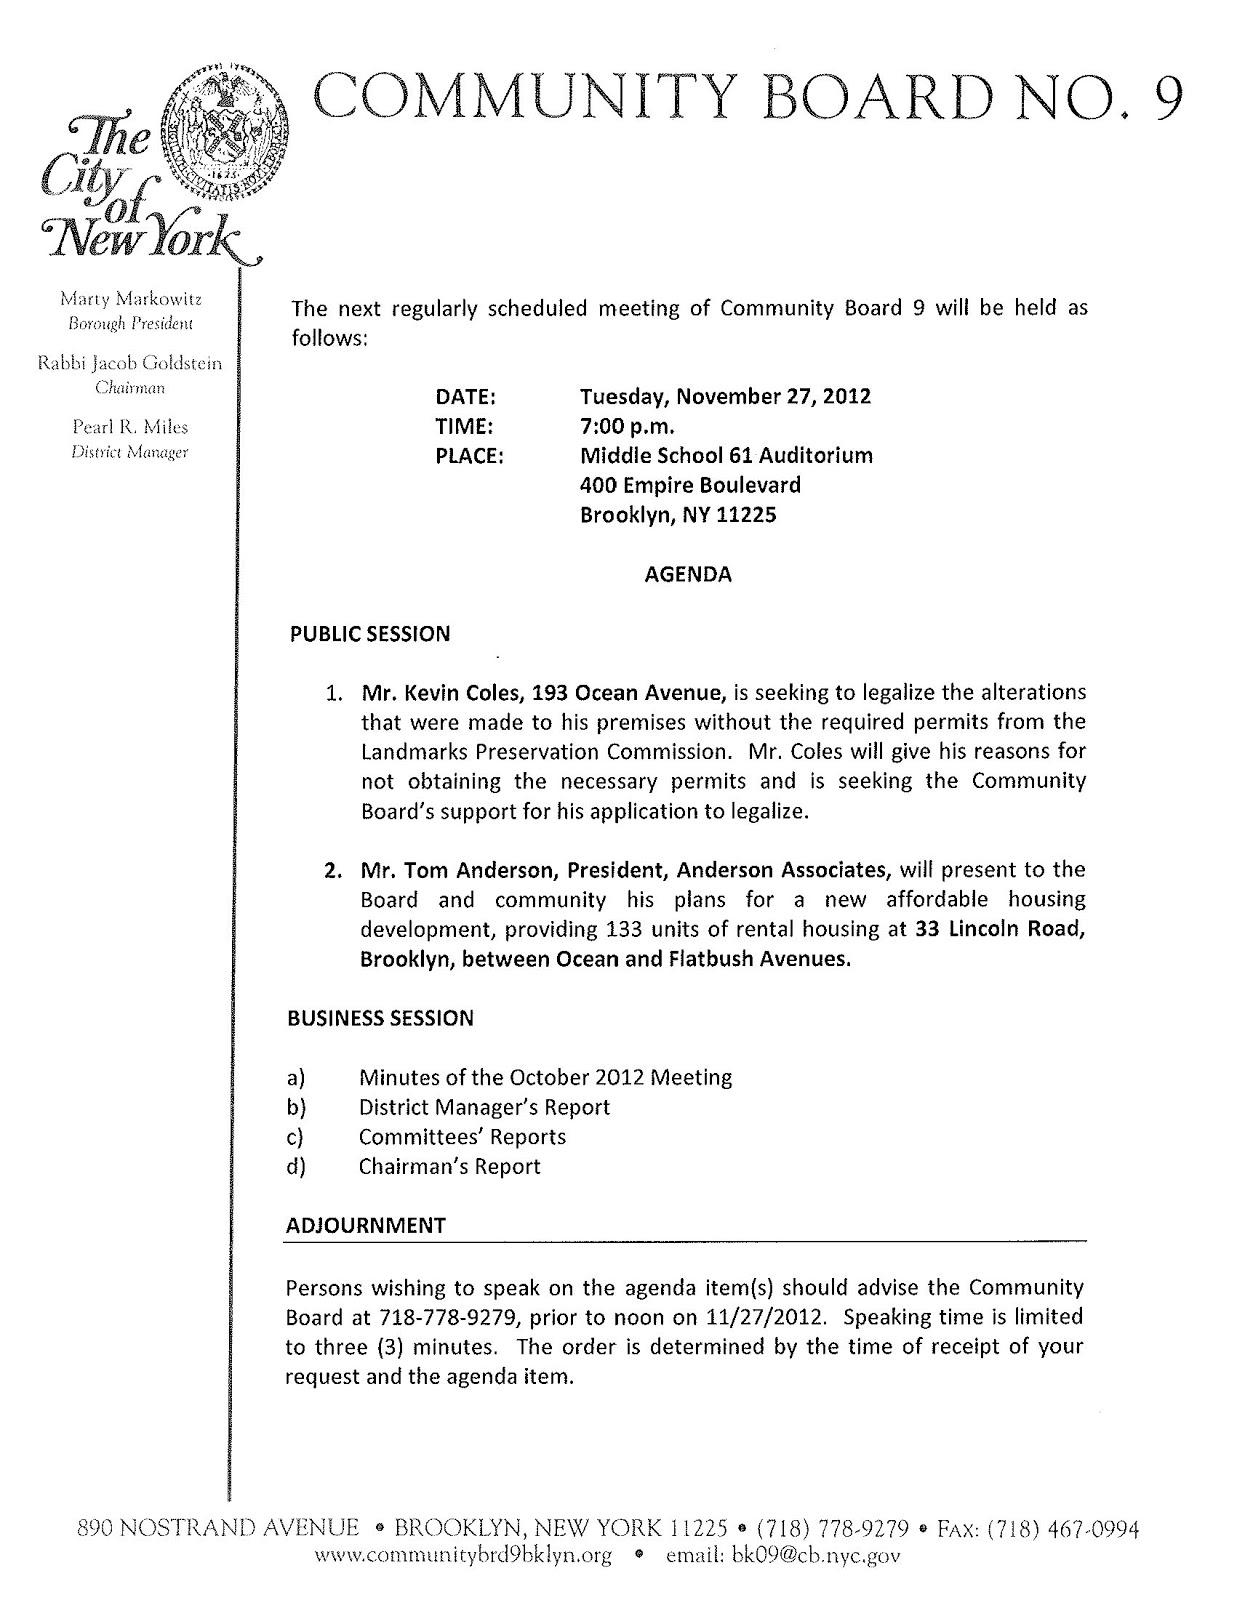 business meeting agenda example